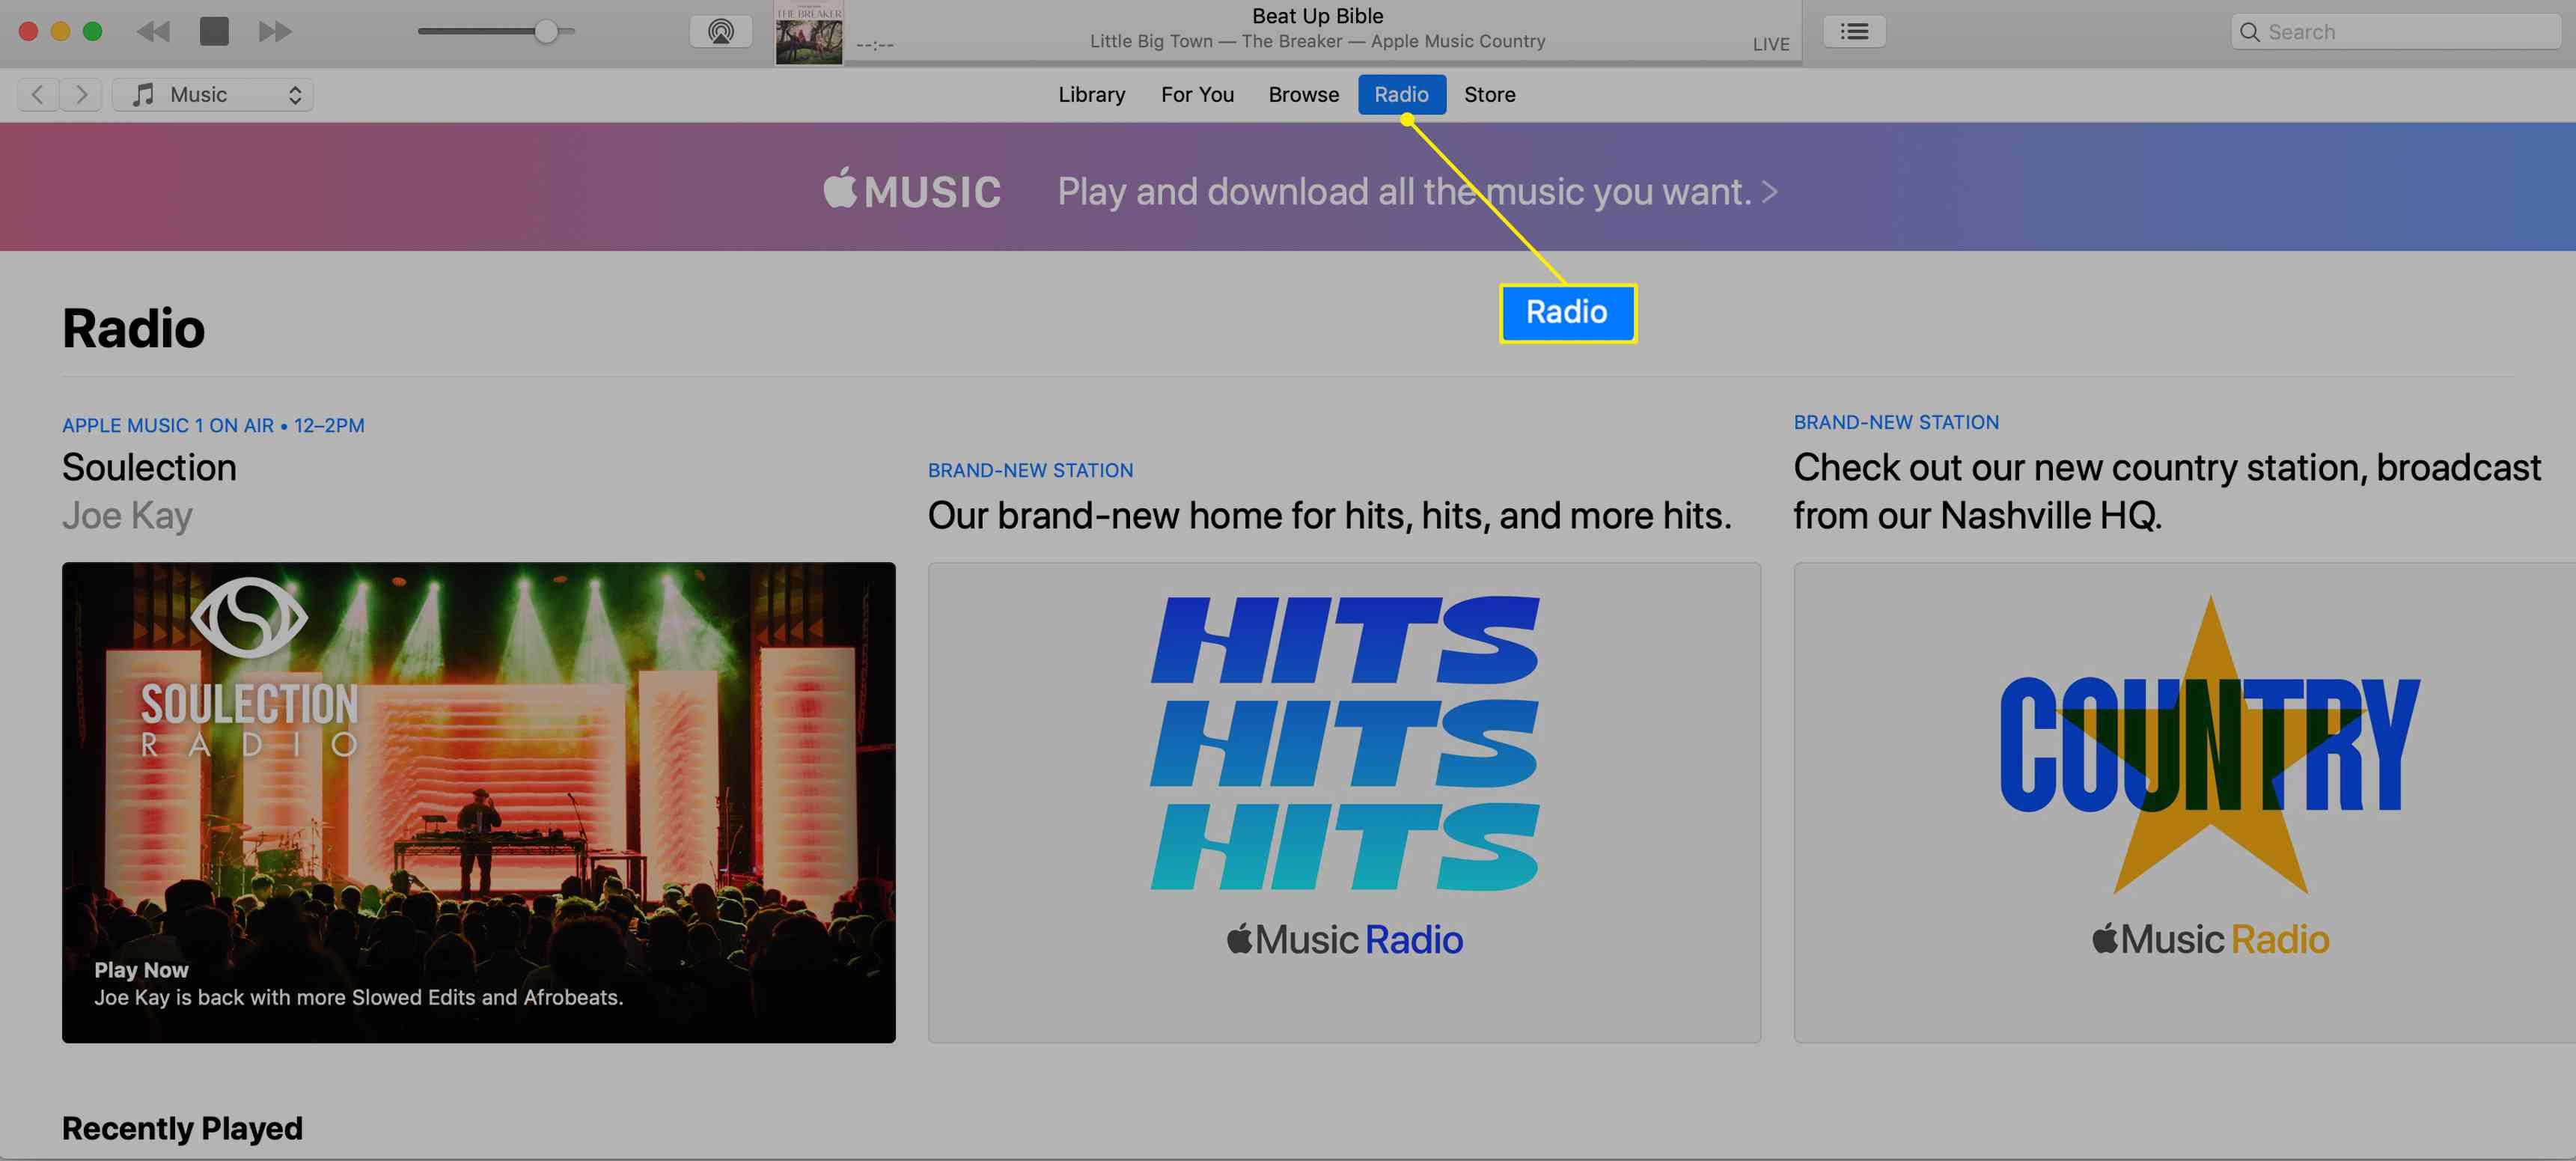 Apple Music Radio on iTunes with Radio highlighted